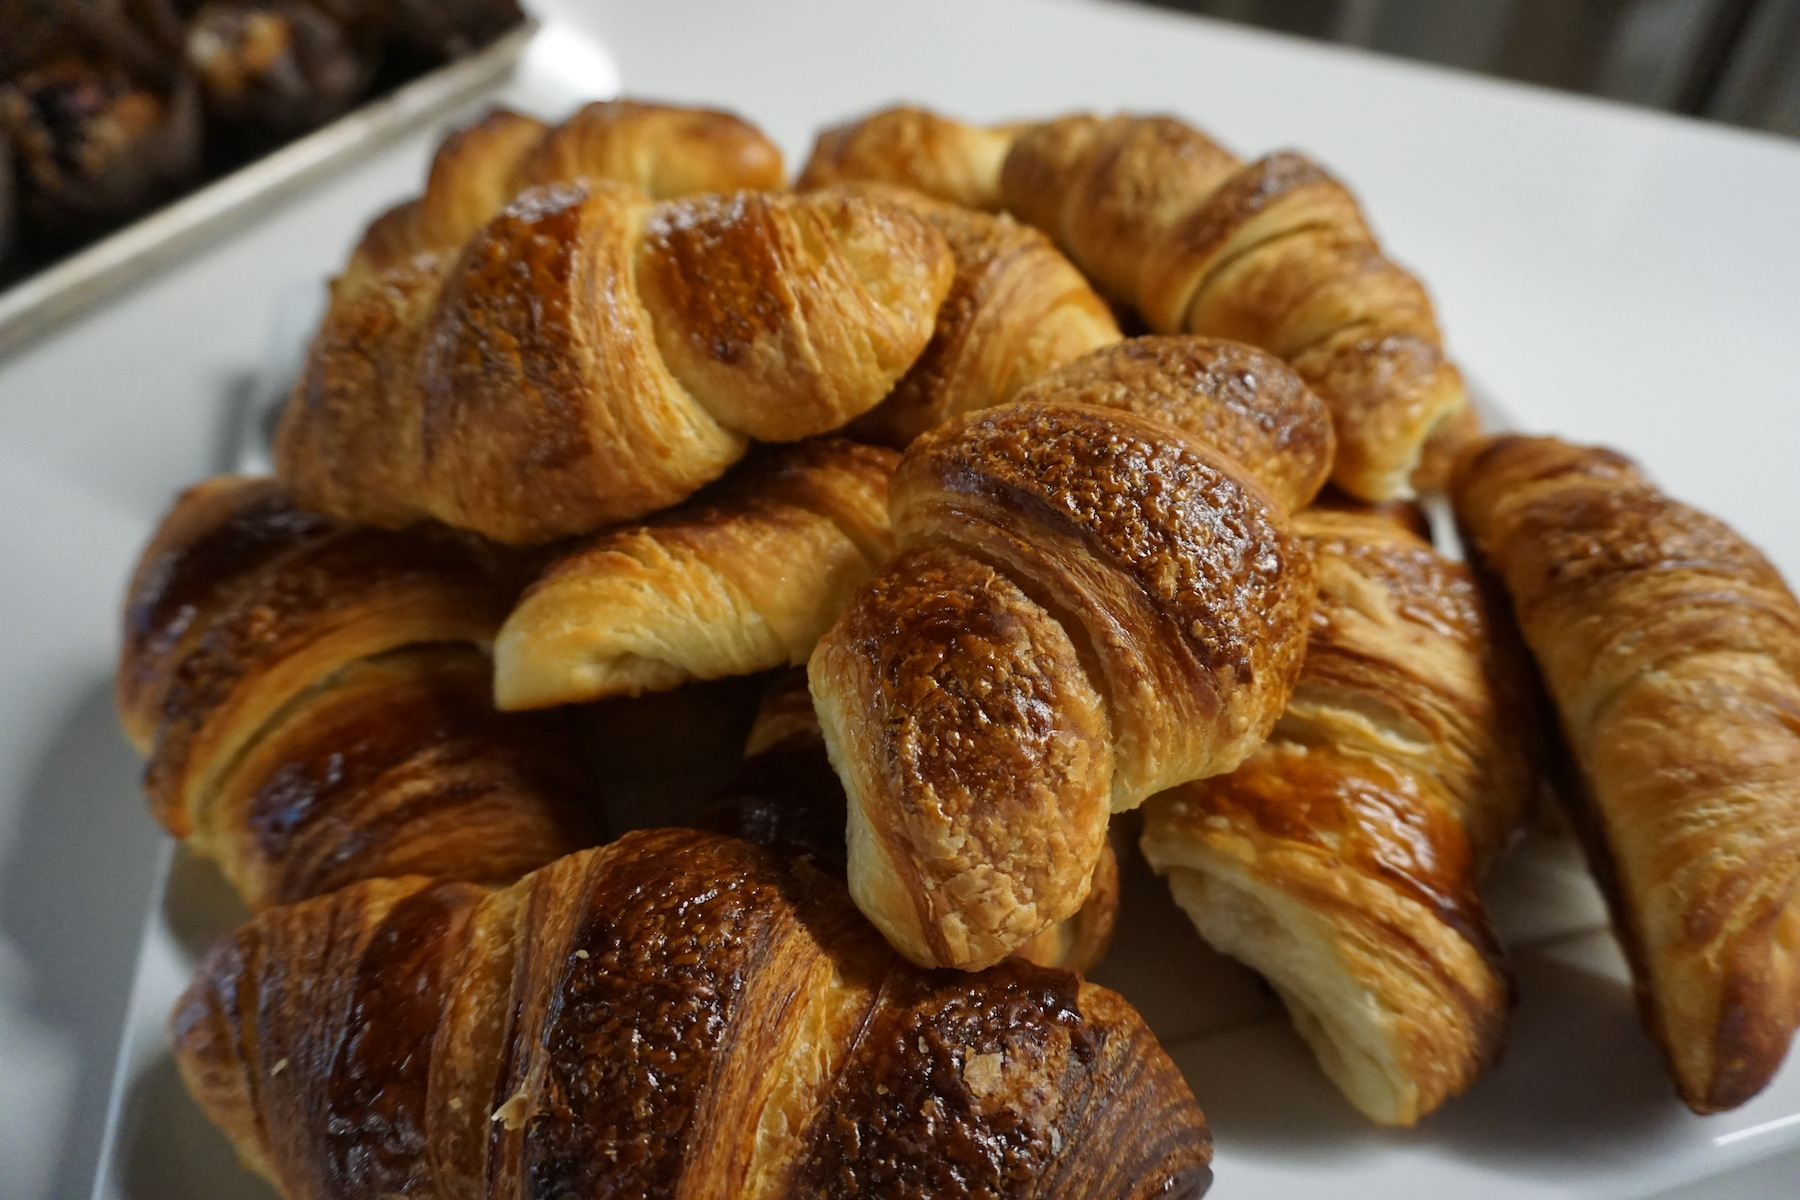 Louismill Bakery